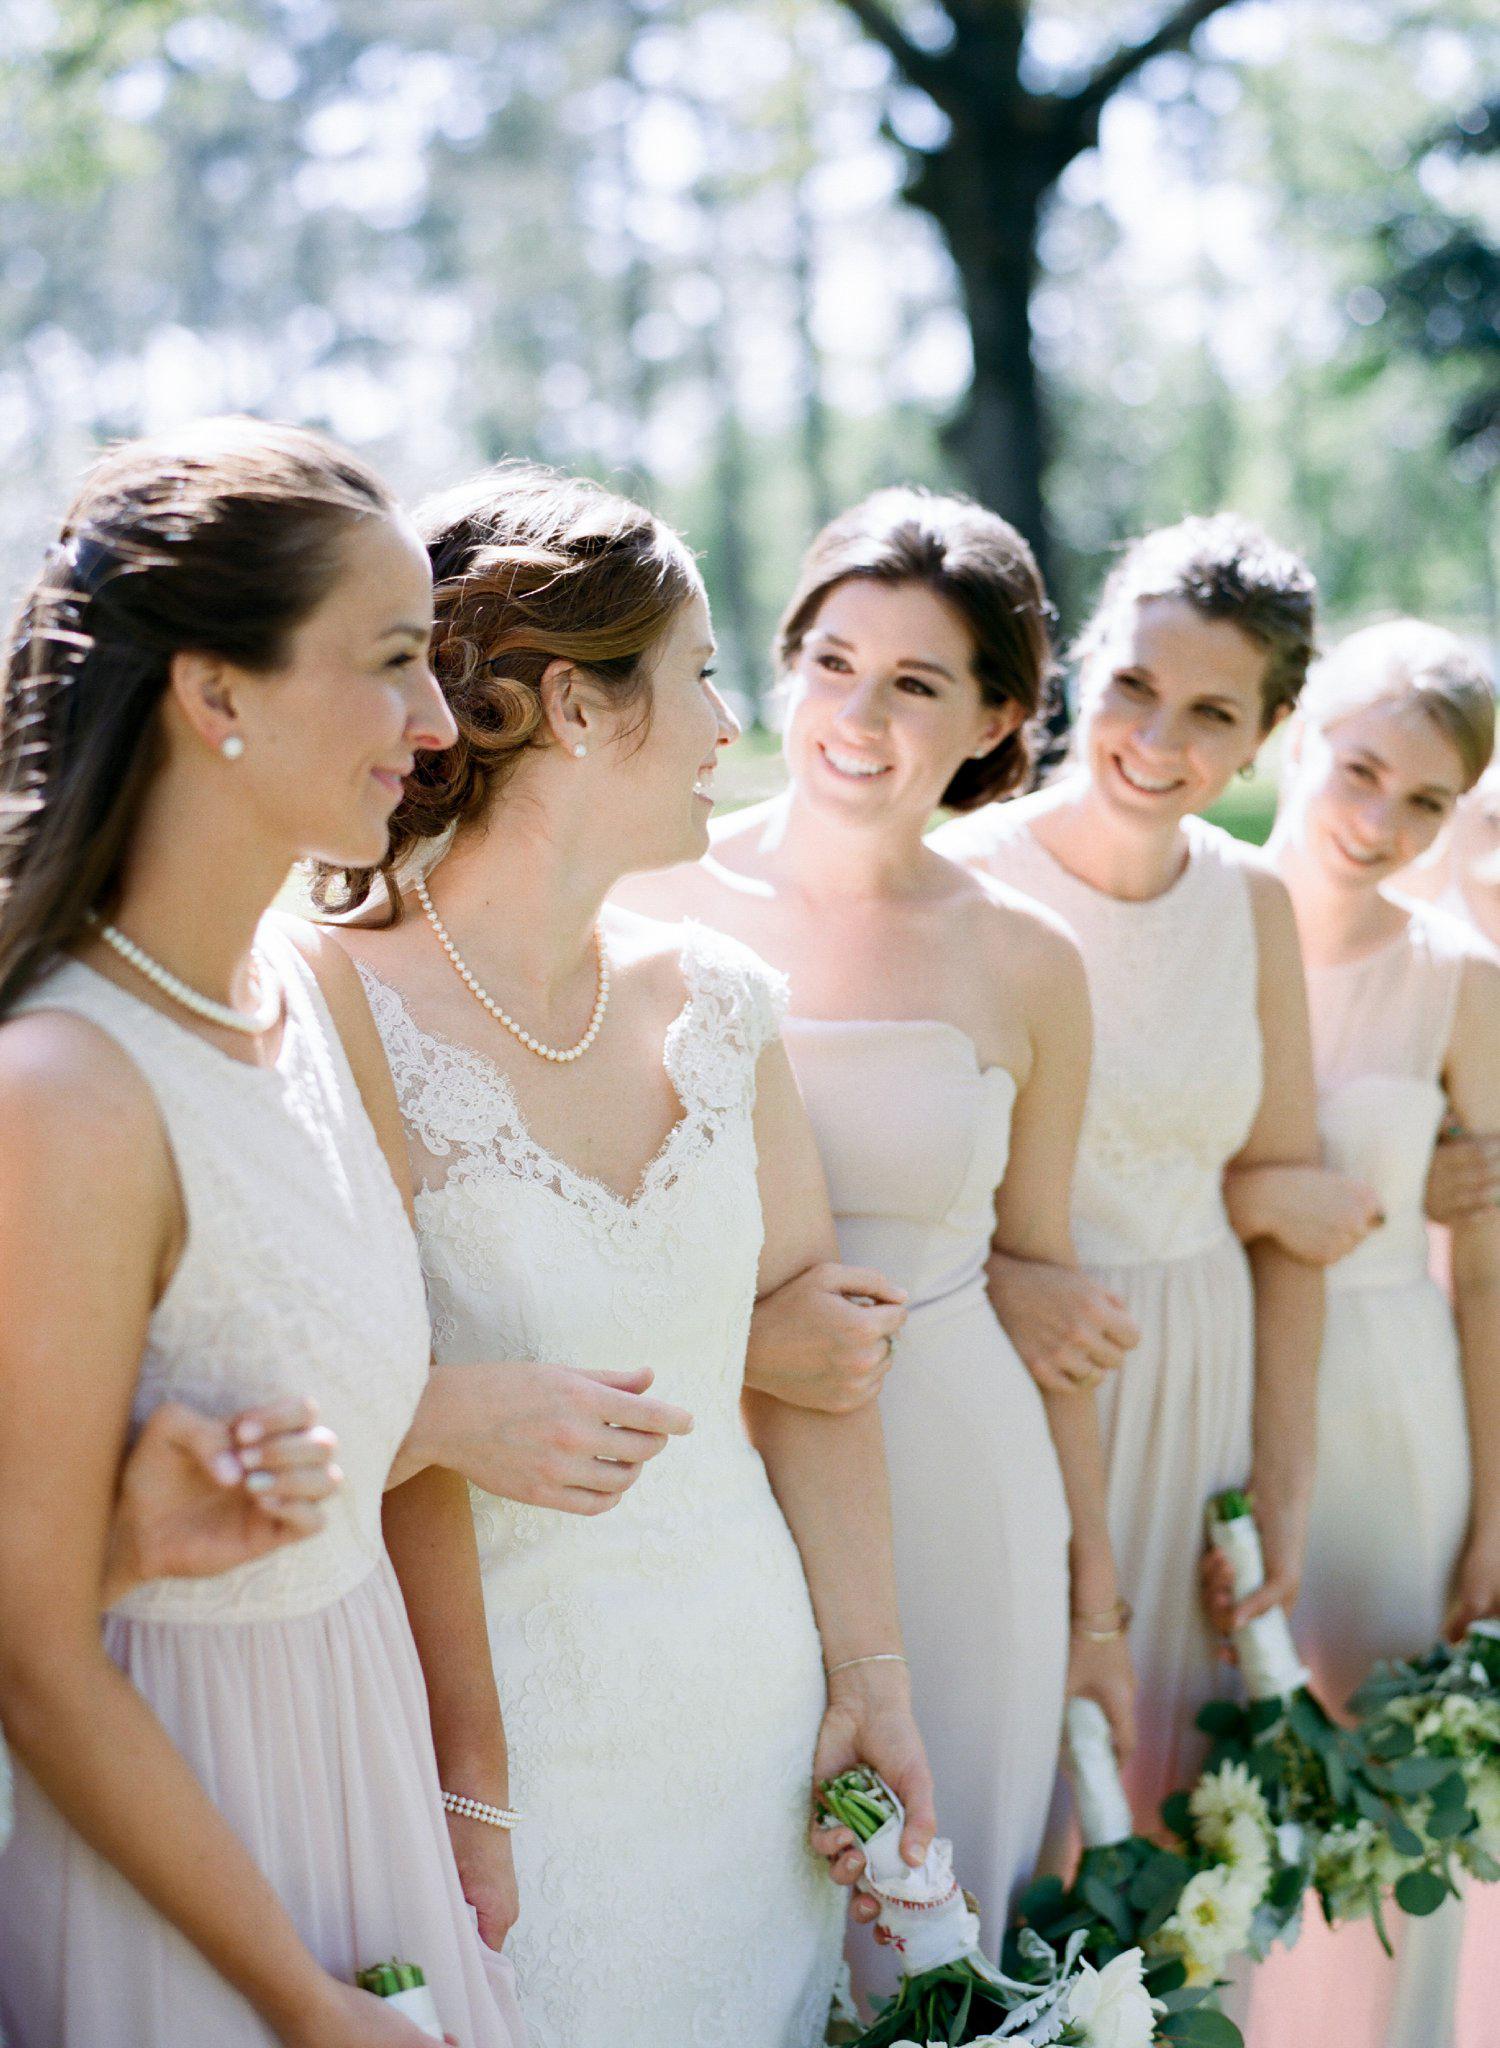 ecila farm wedding albany georgia wedding photographer shannon griffin photography-29.jpg